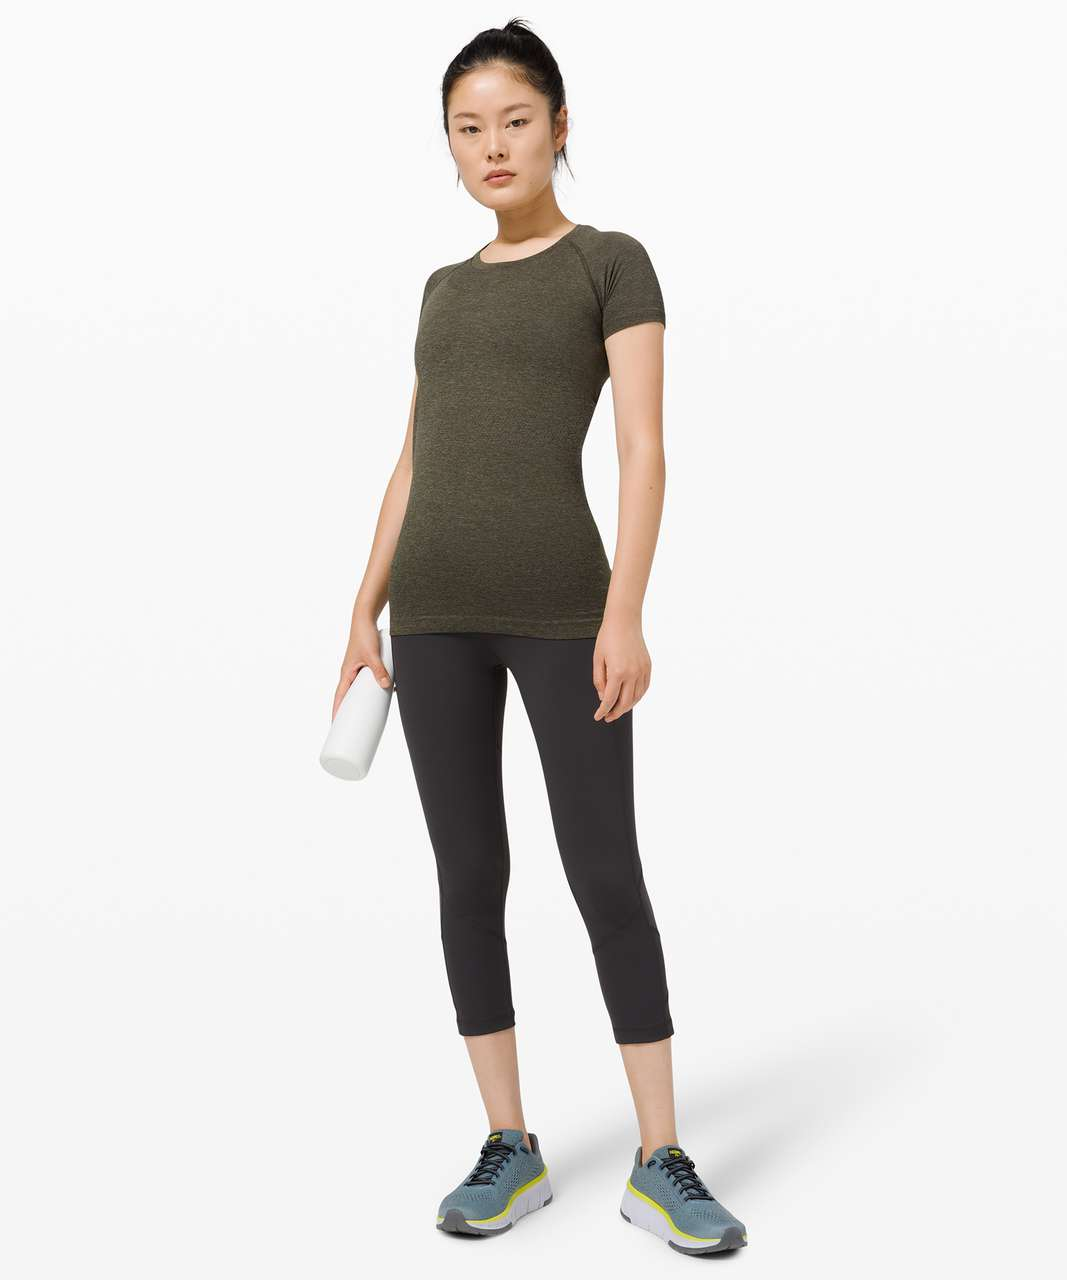 Lululemon Swiftly Tech Short Sleeve 2.0 - Grey Sage / Dark Olive